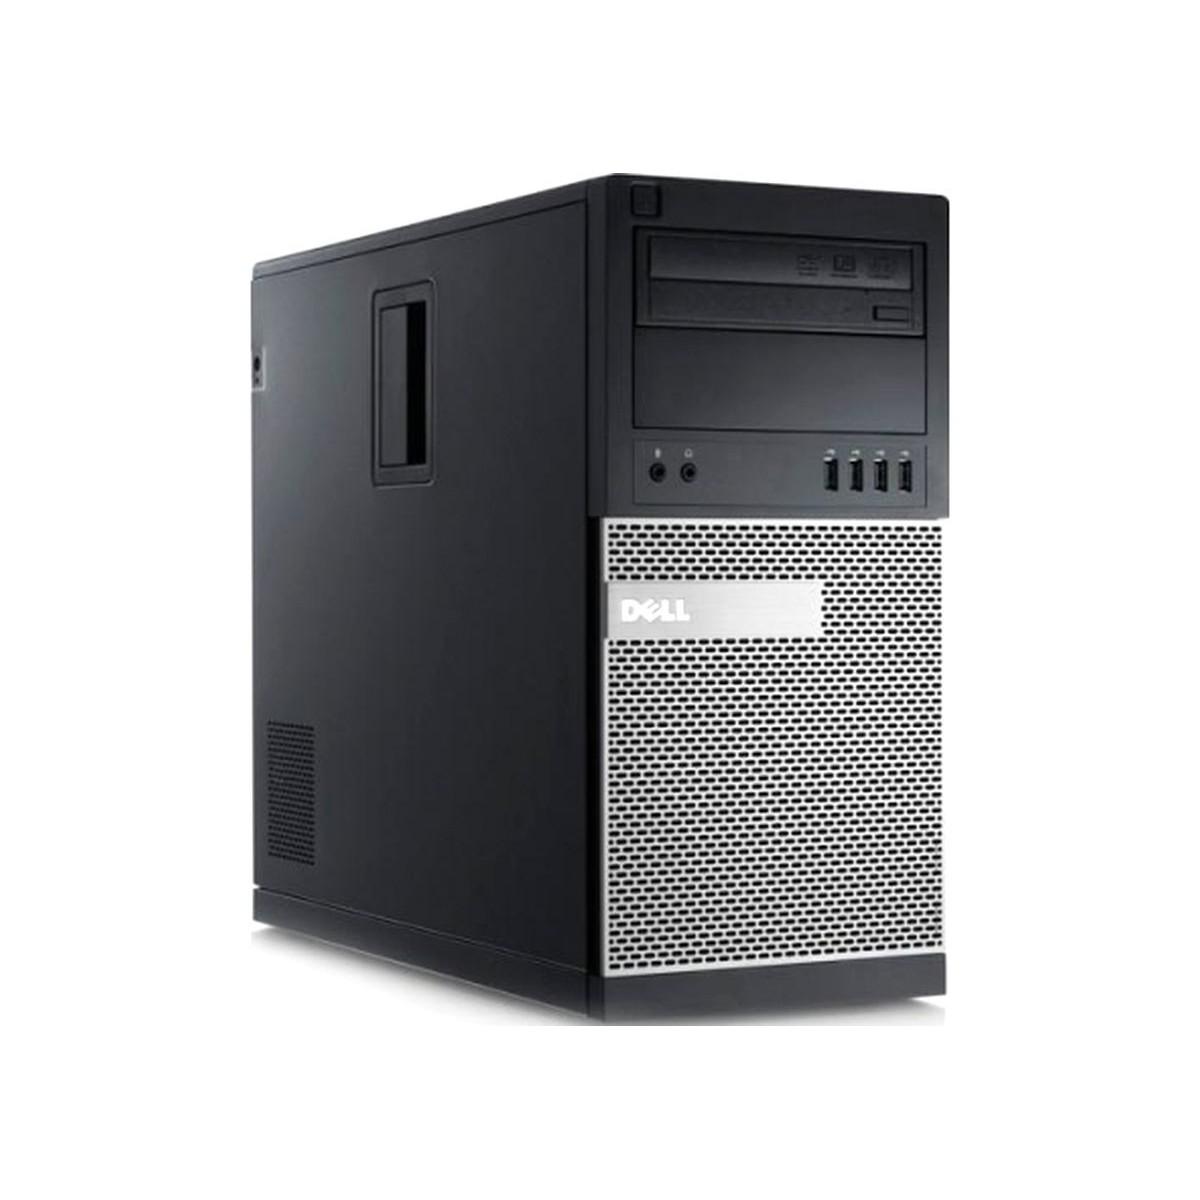 LENOVO TS130 E3 1245v2 8GB 2x500 WIN2008 R2 STD